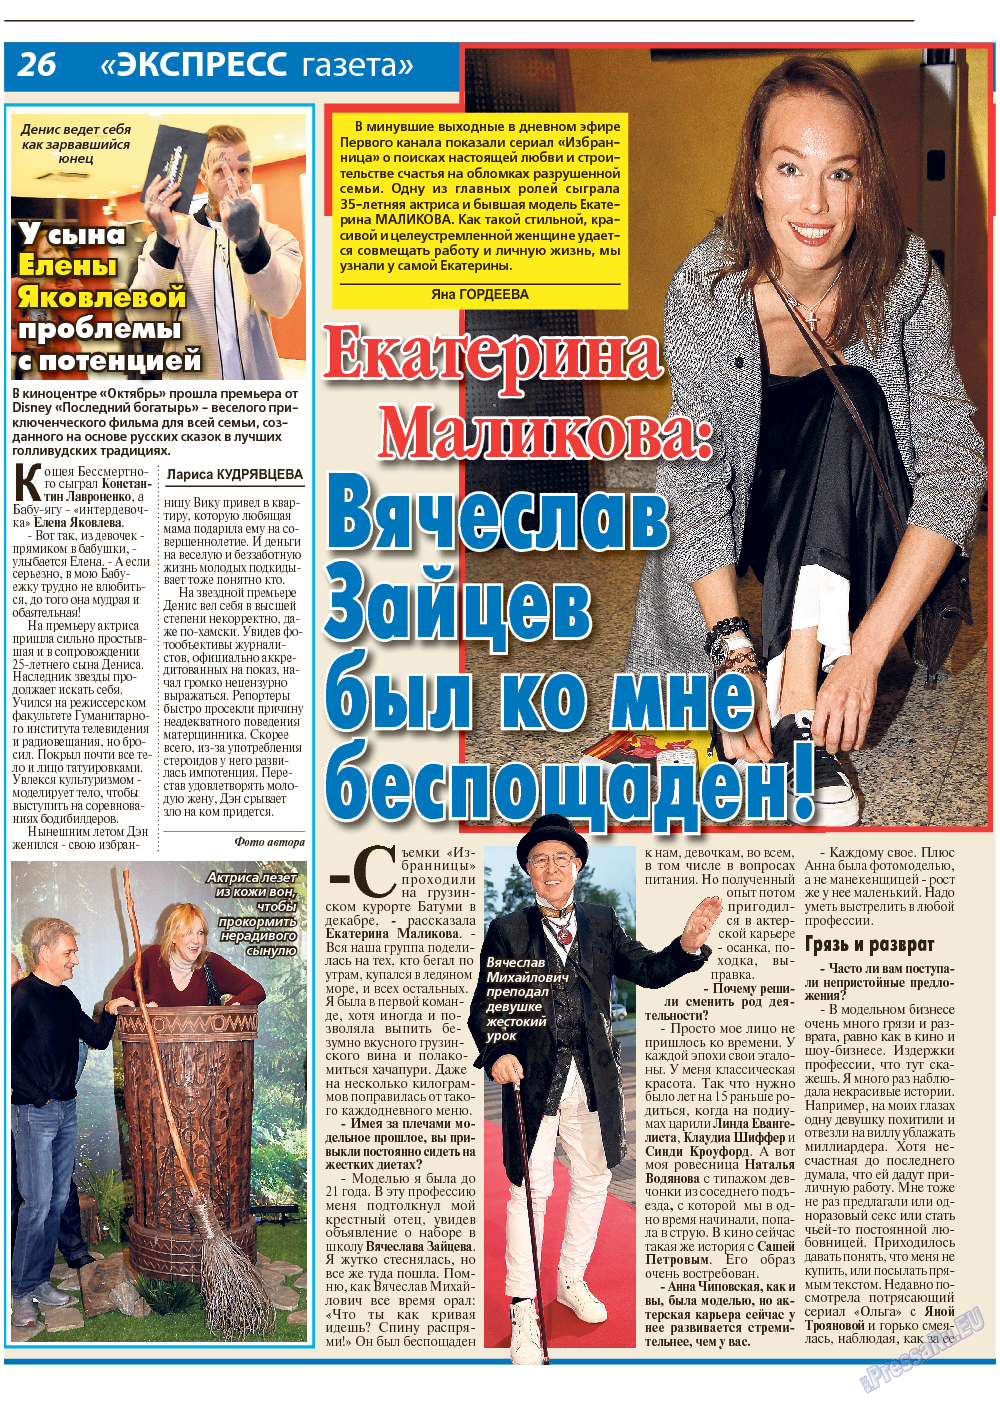 Экспресс газета (газета). 2017 год, номер 11, стр. 26